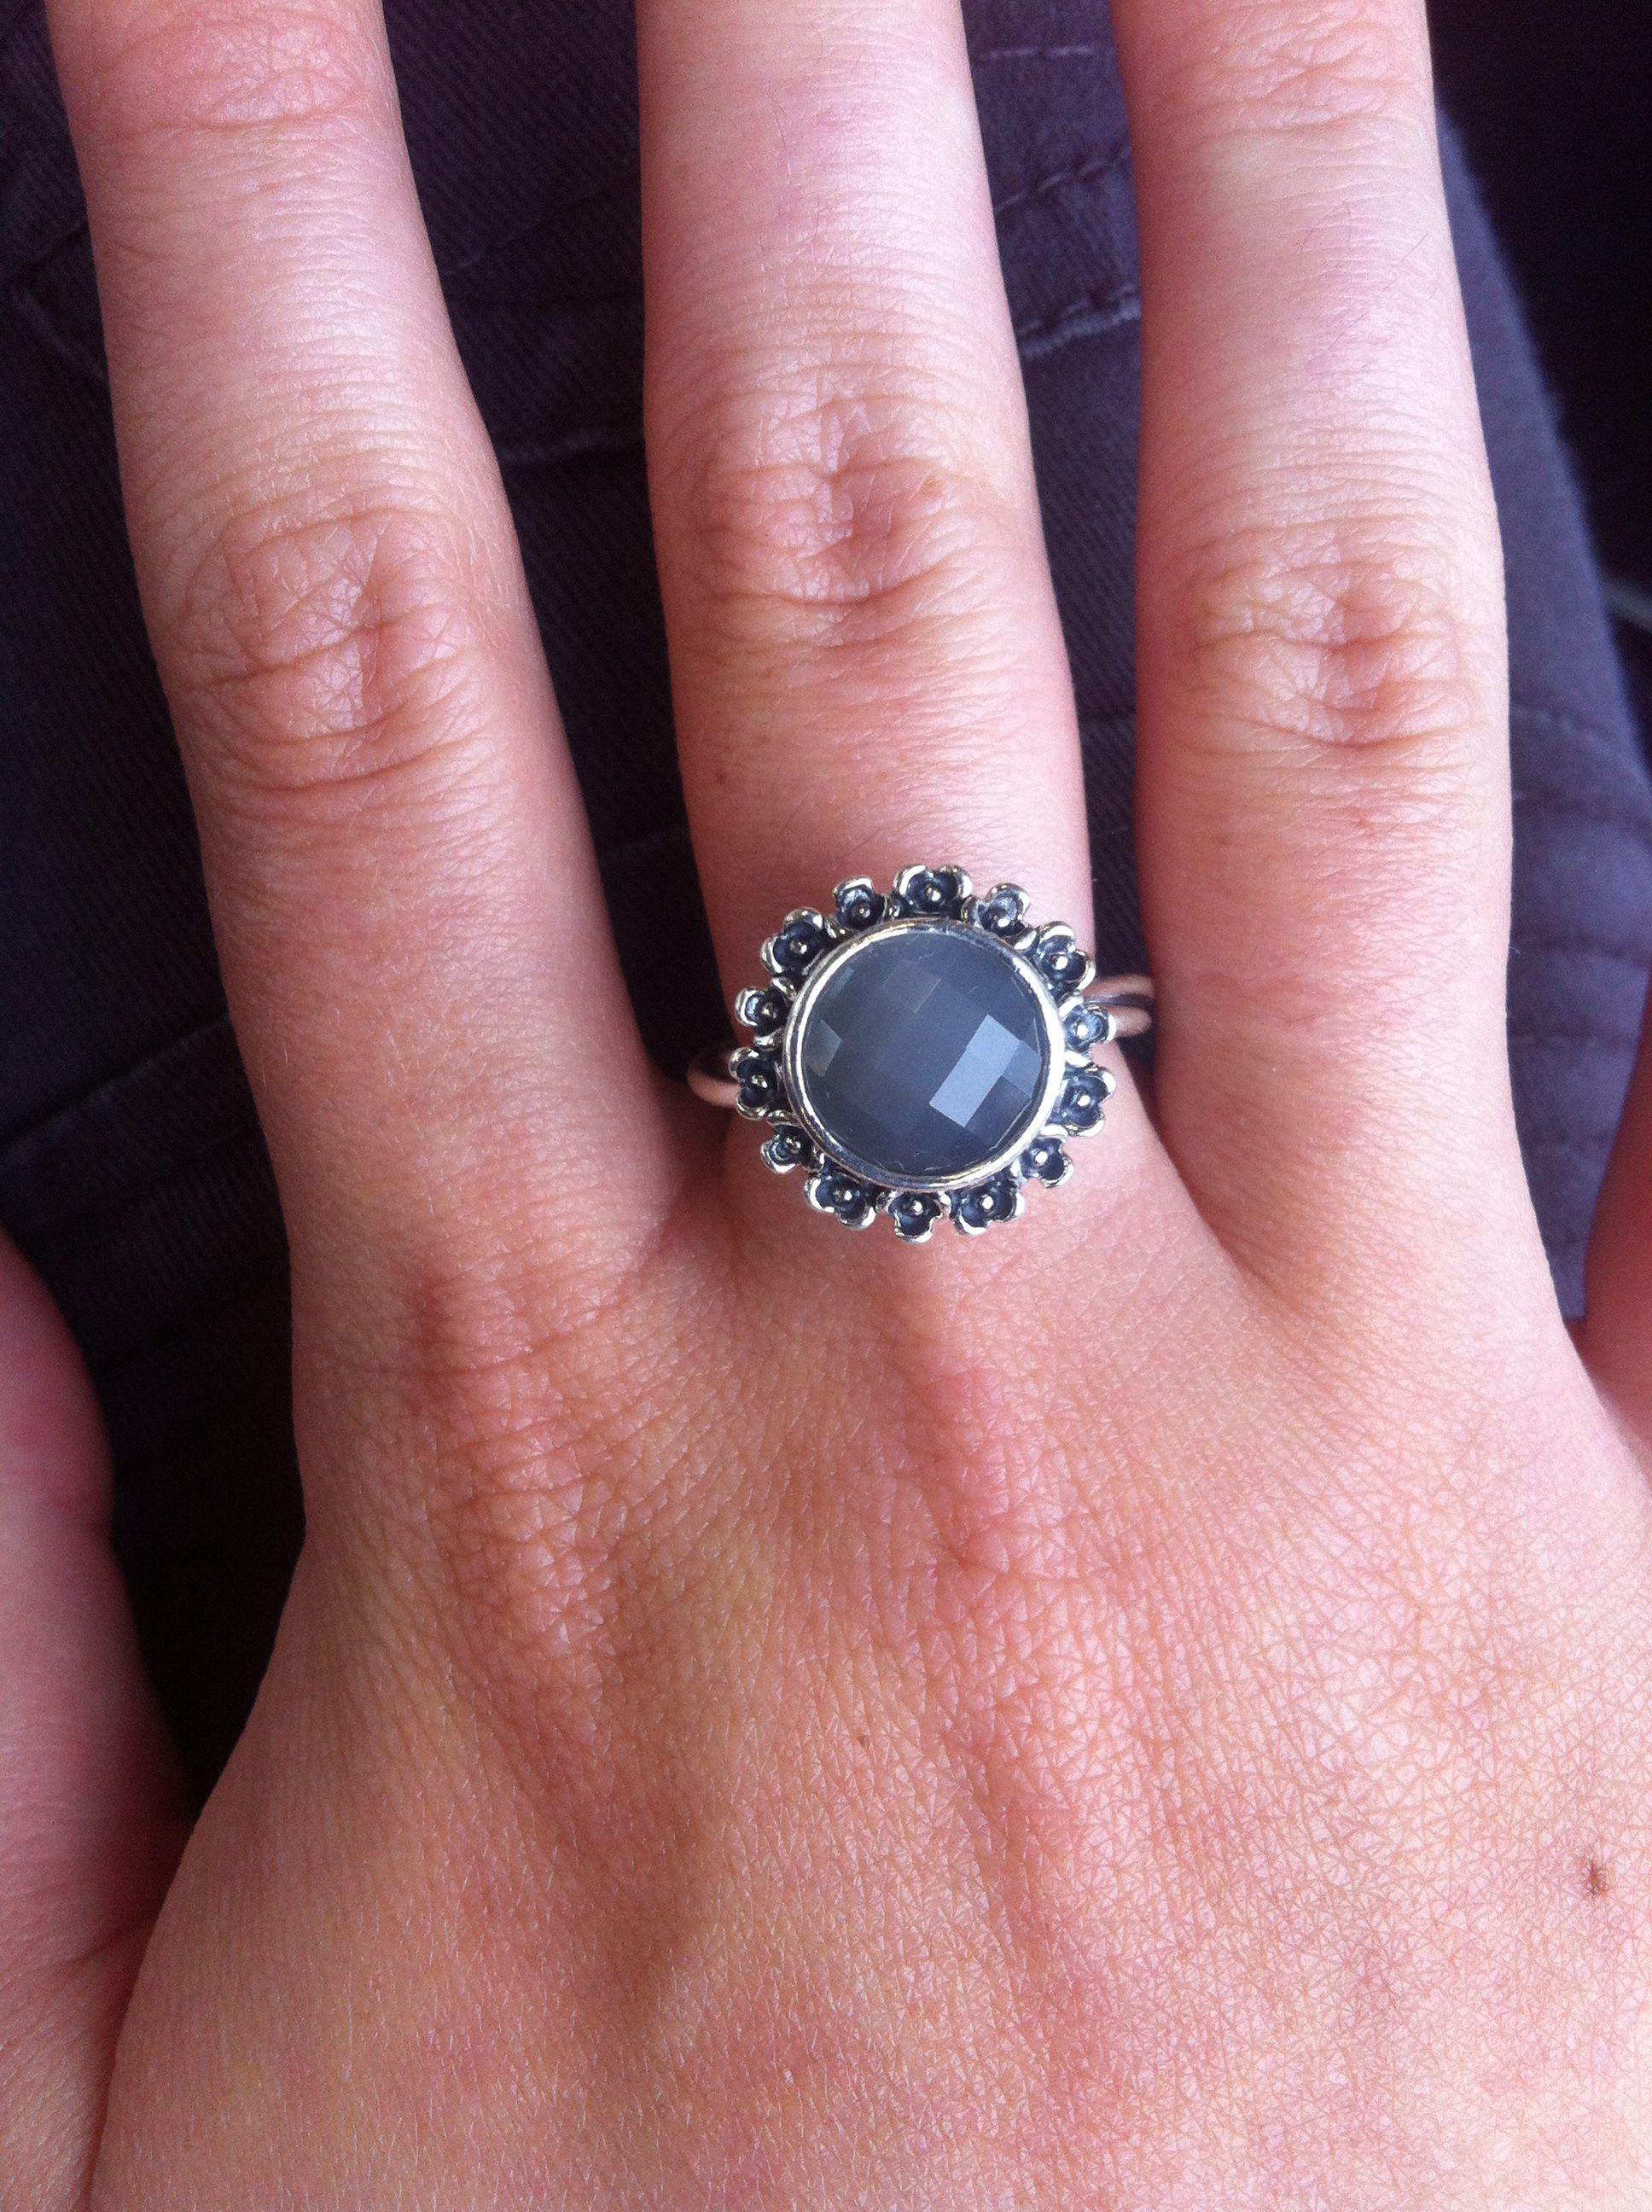 My new Pandora ring! 3 year anniversary present from Ian! Love it ...